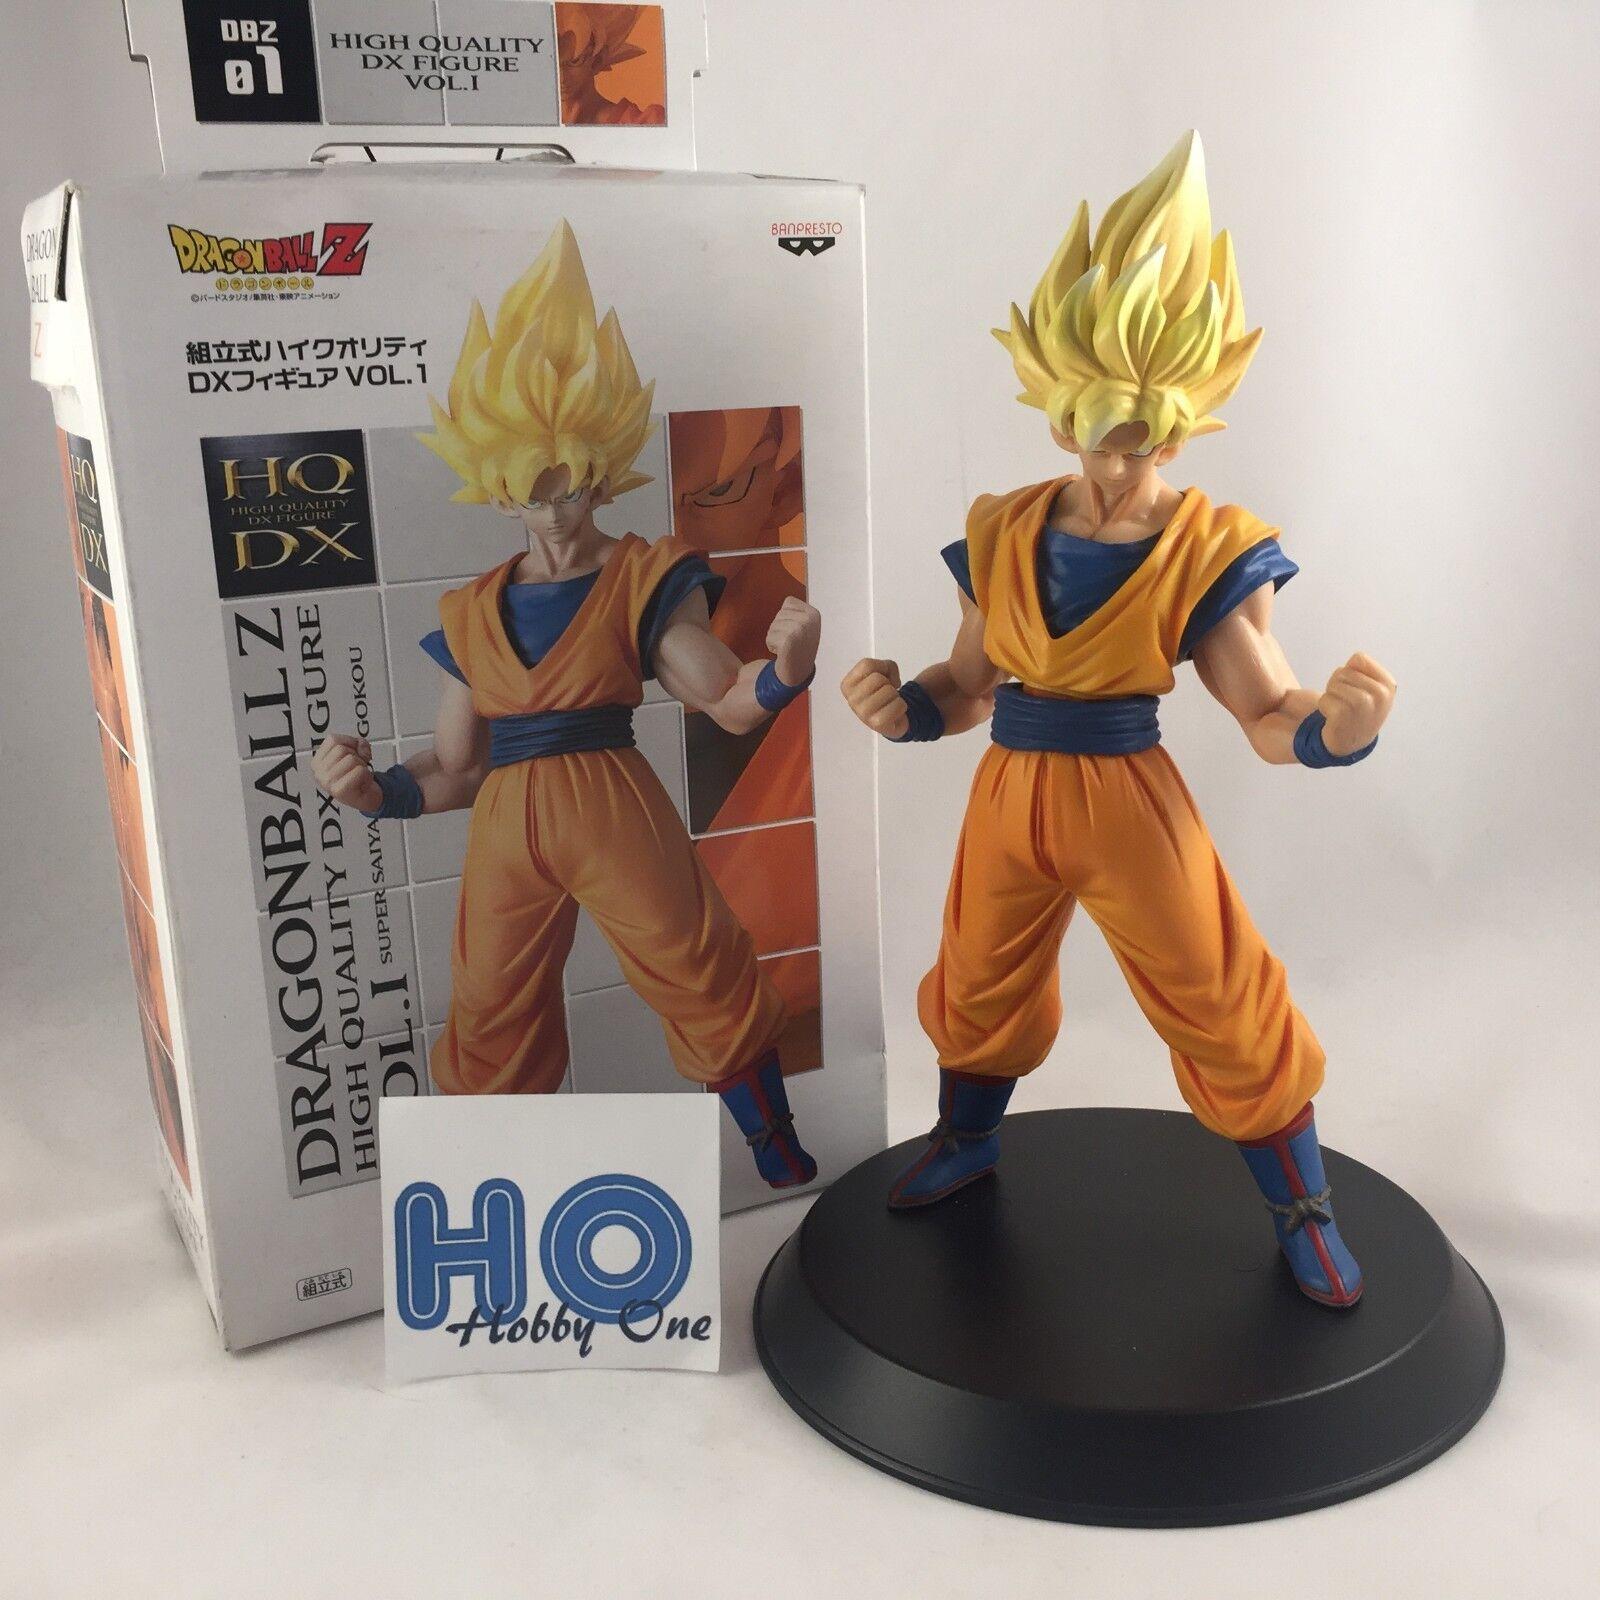 Dragon Ball Z High Quality DX Super Saiyan Sound Goku ± 20 cm Banpresto